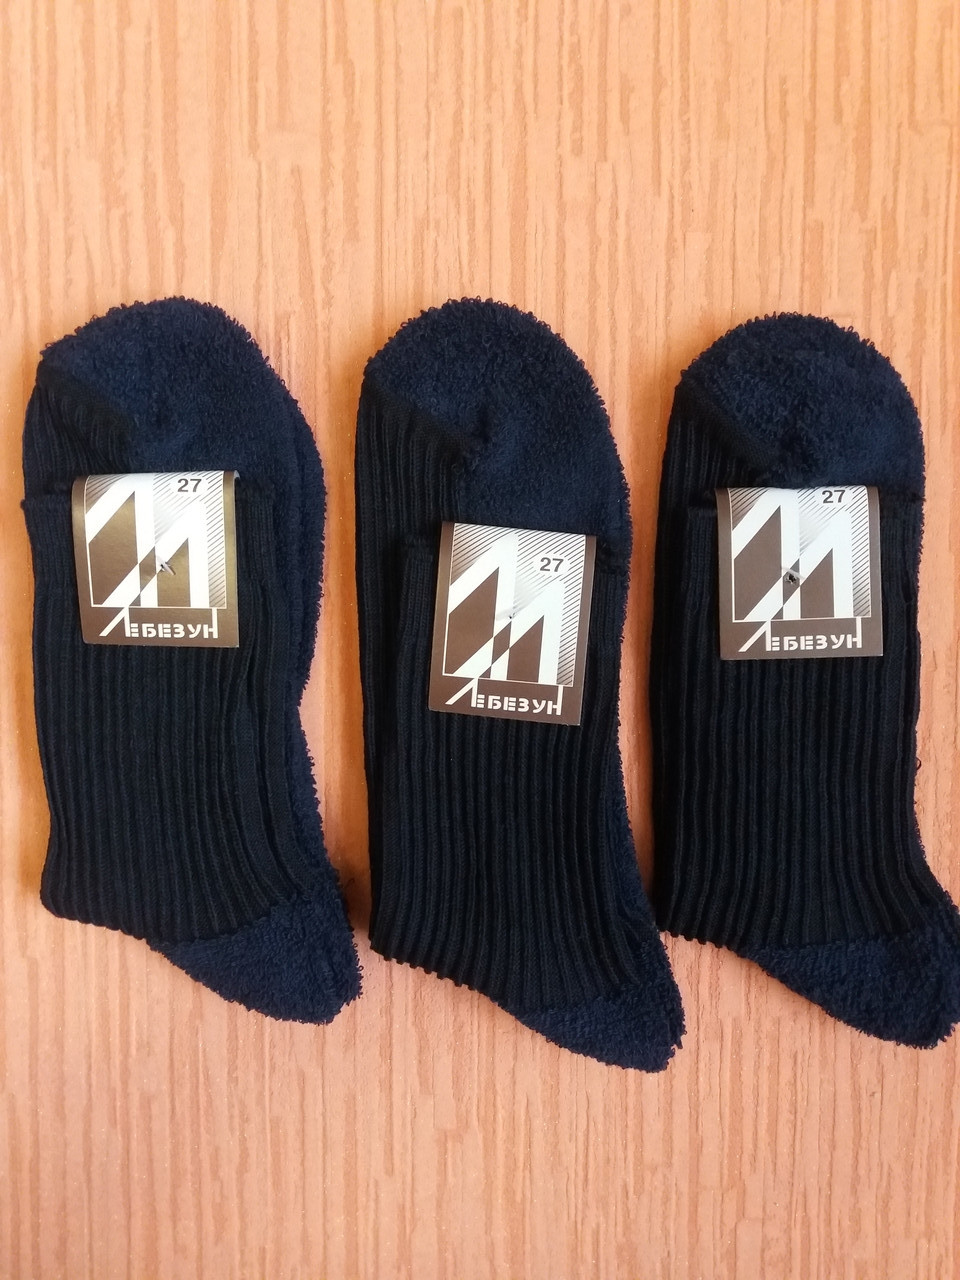 Носки мужские Украина теплые махровые пятка и ступня р.27. От 10 пар по 9грн